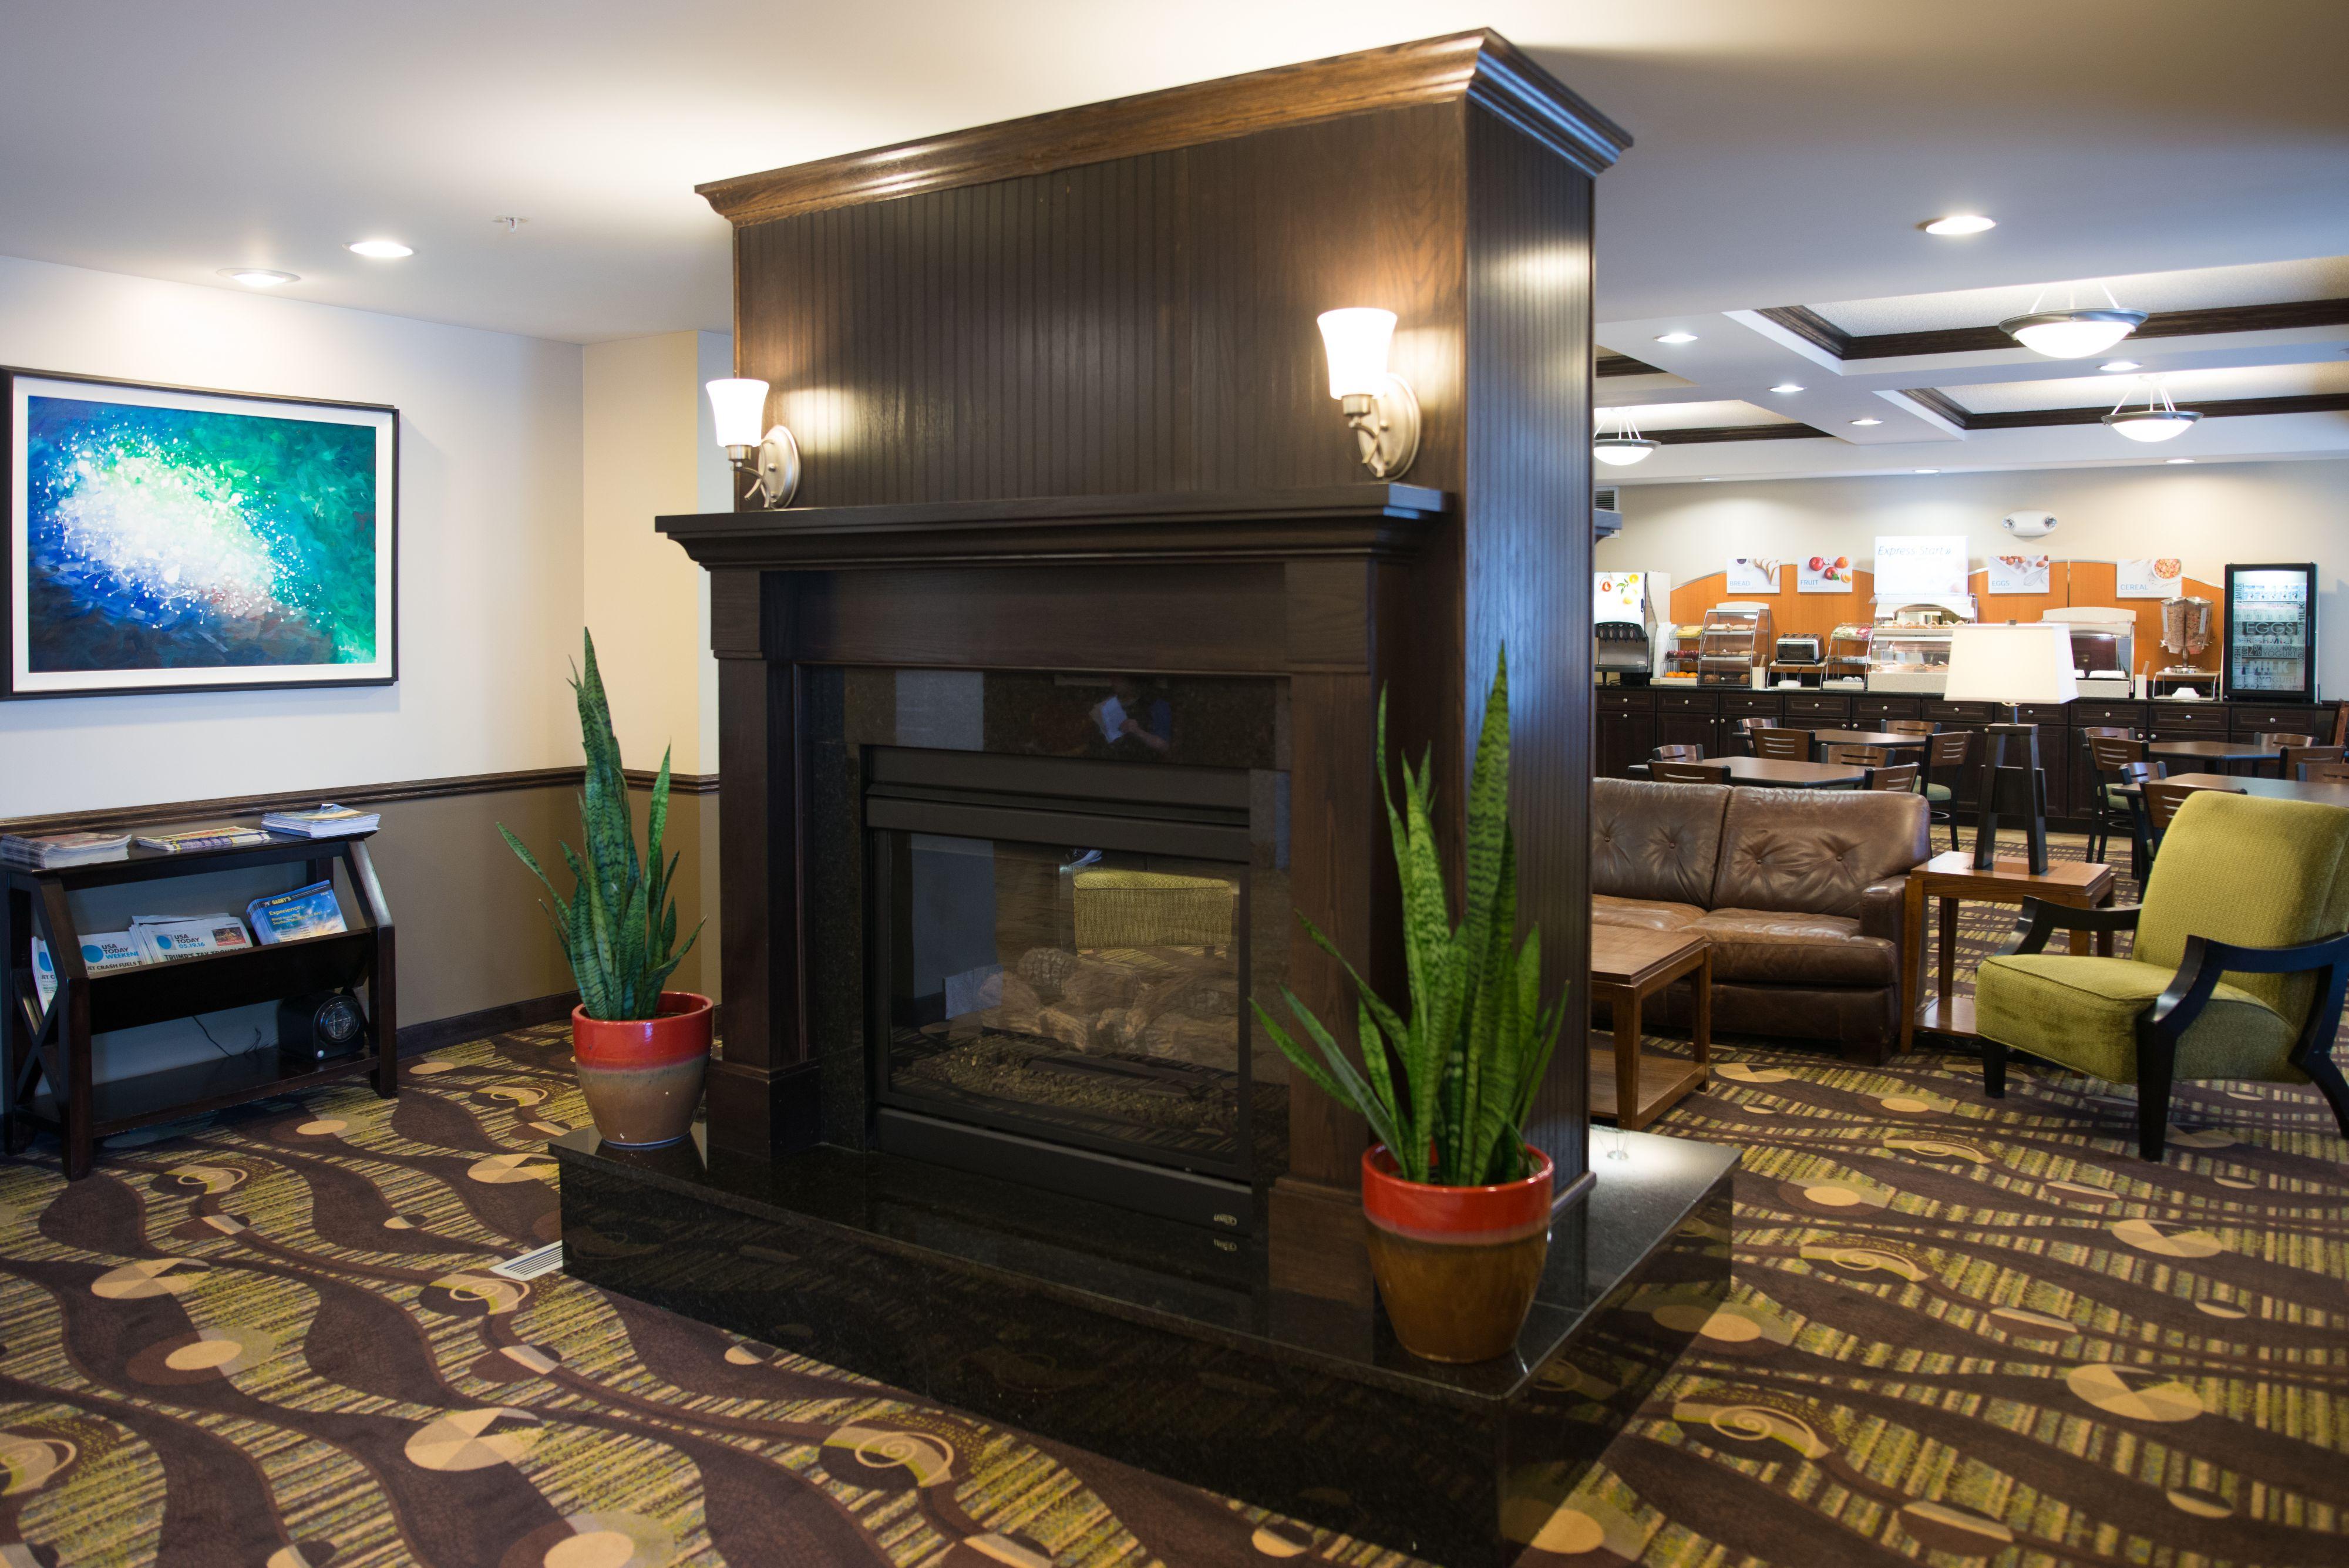 Holiday Inn Express & Suites Northwood image 8